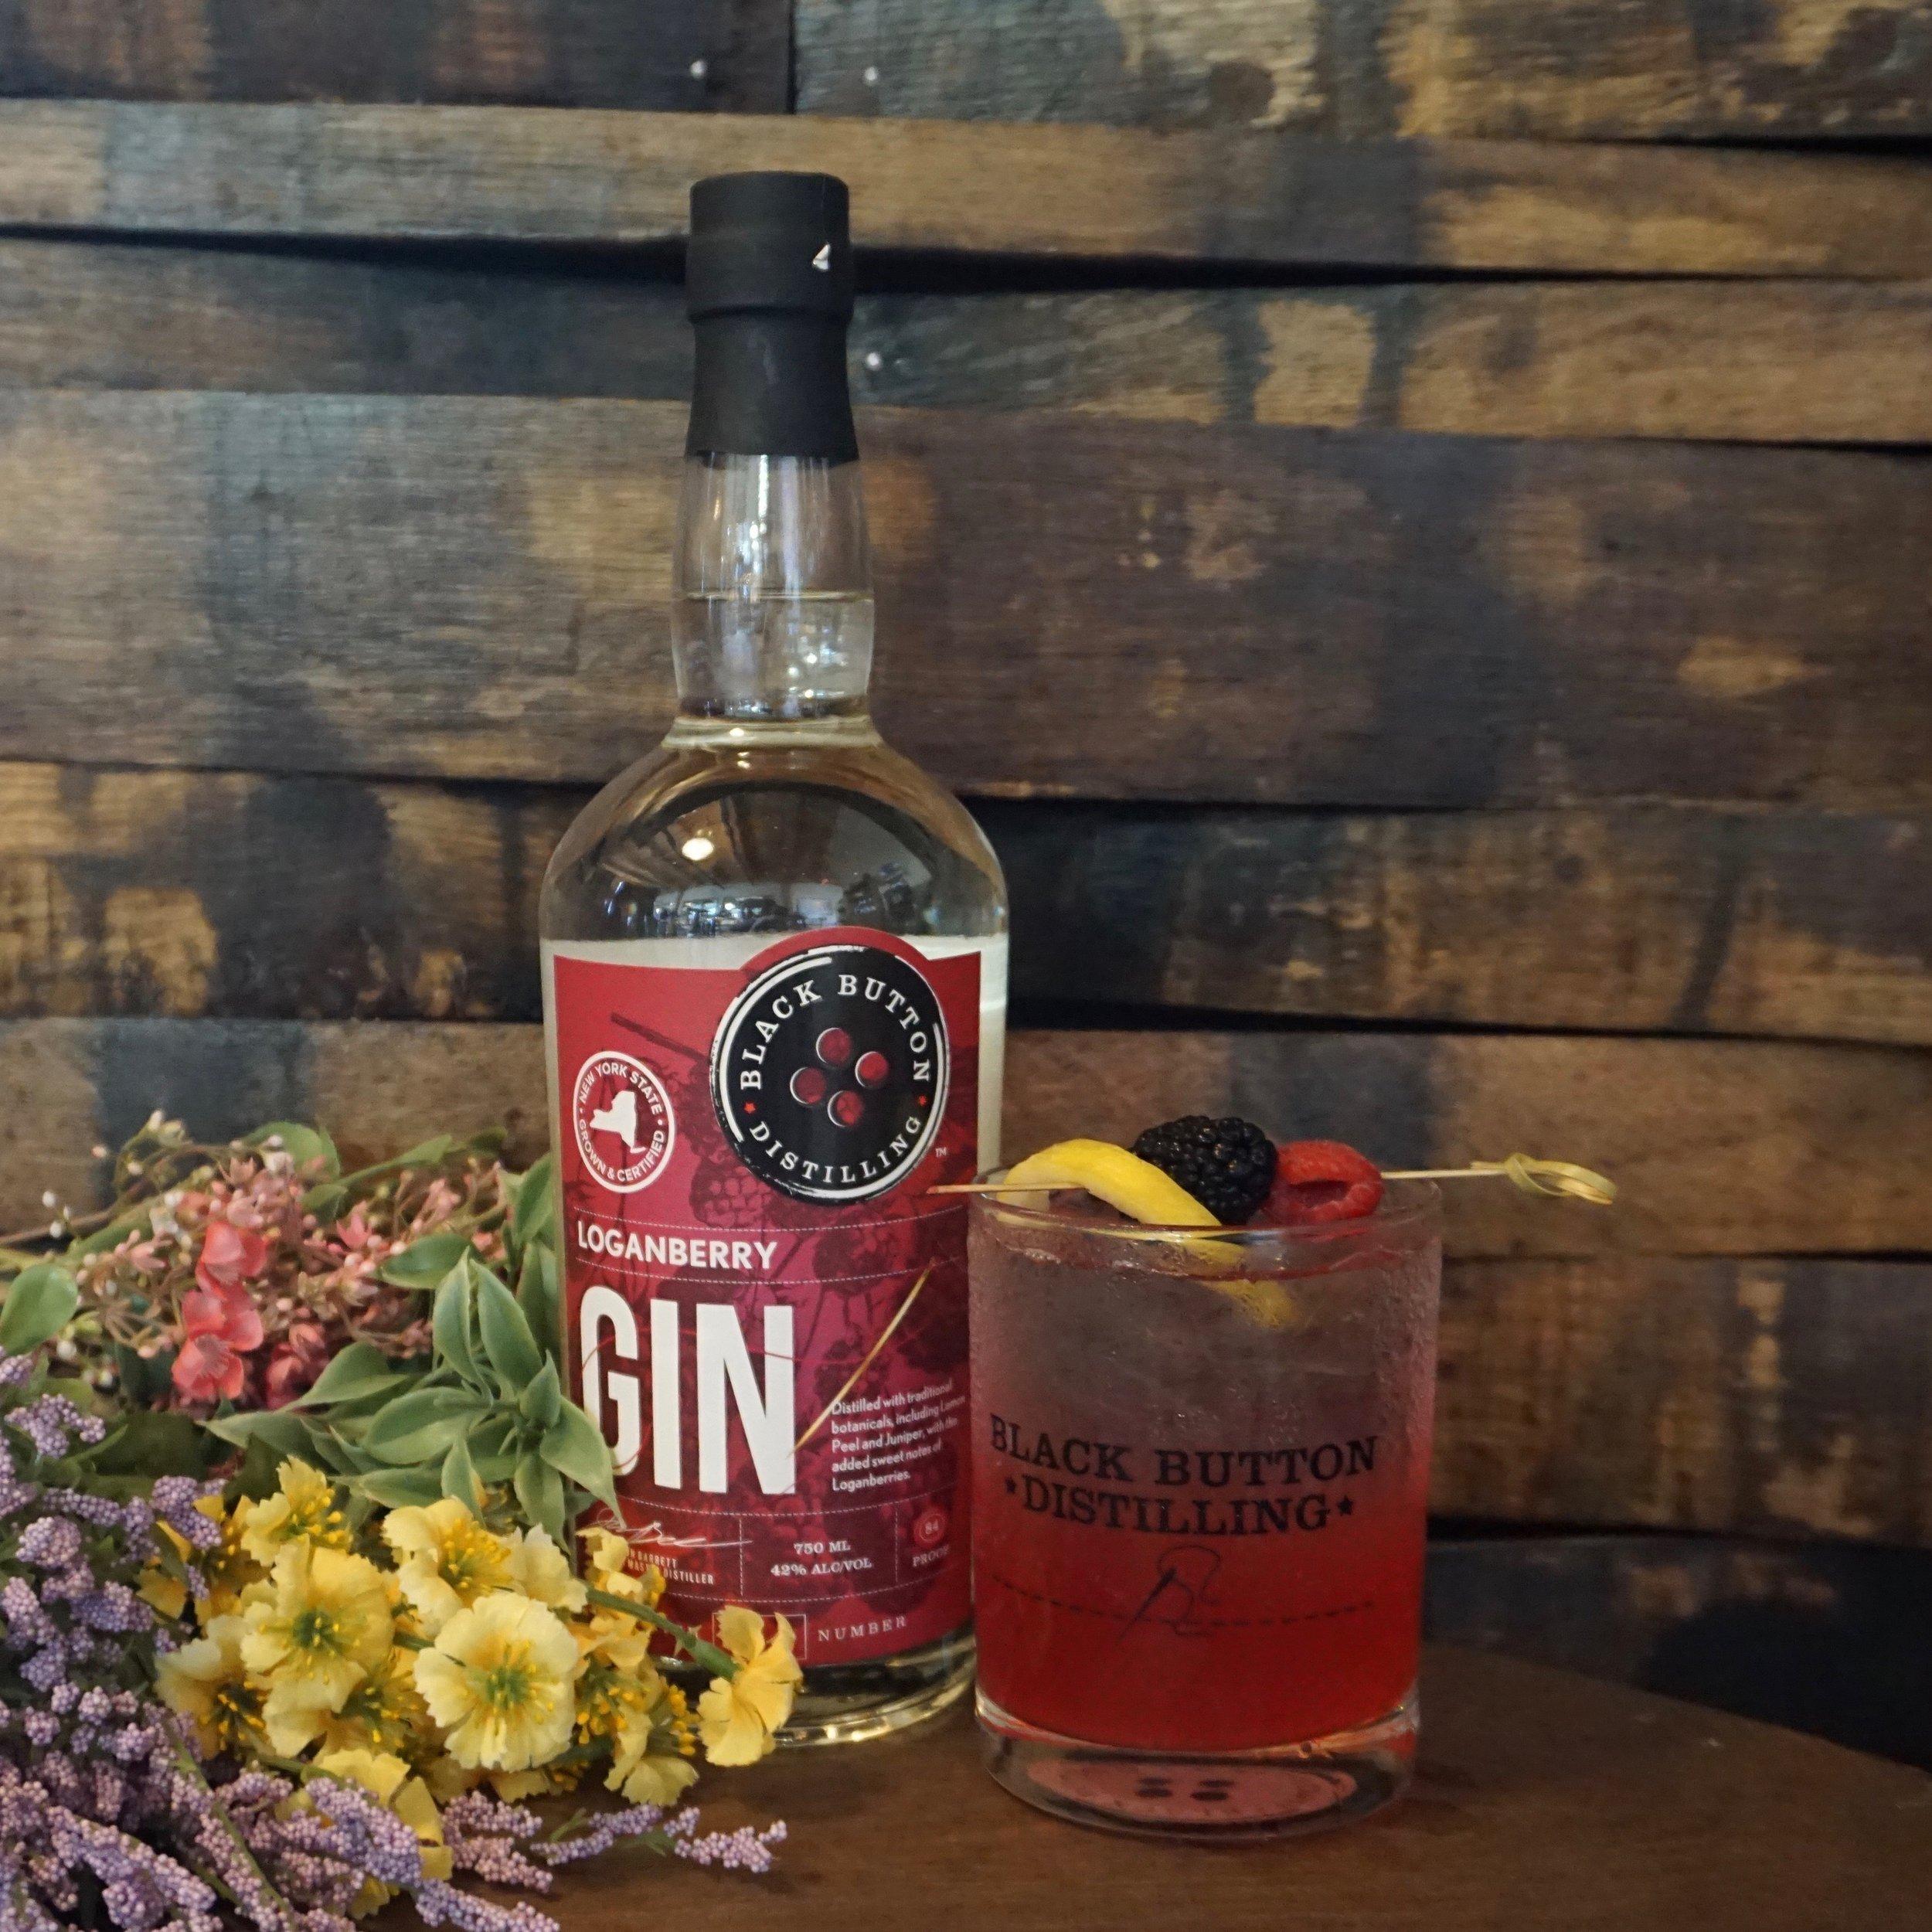 Black Button Distilling award winning loganberry gin next to a loganberry gin cocktail